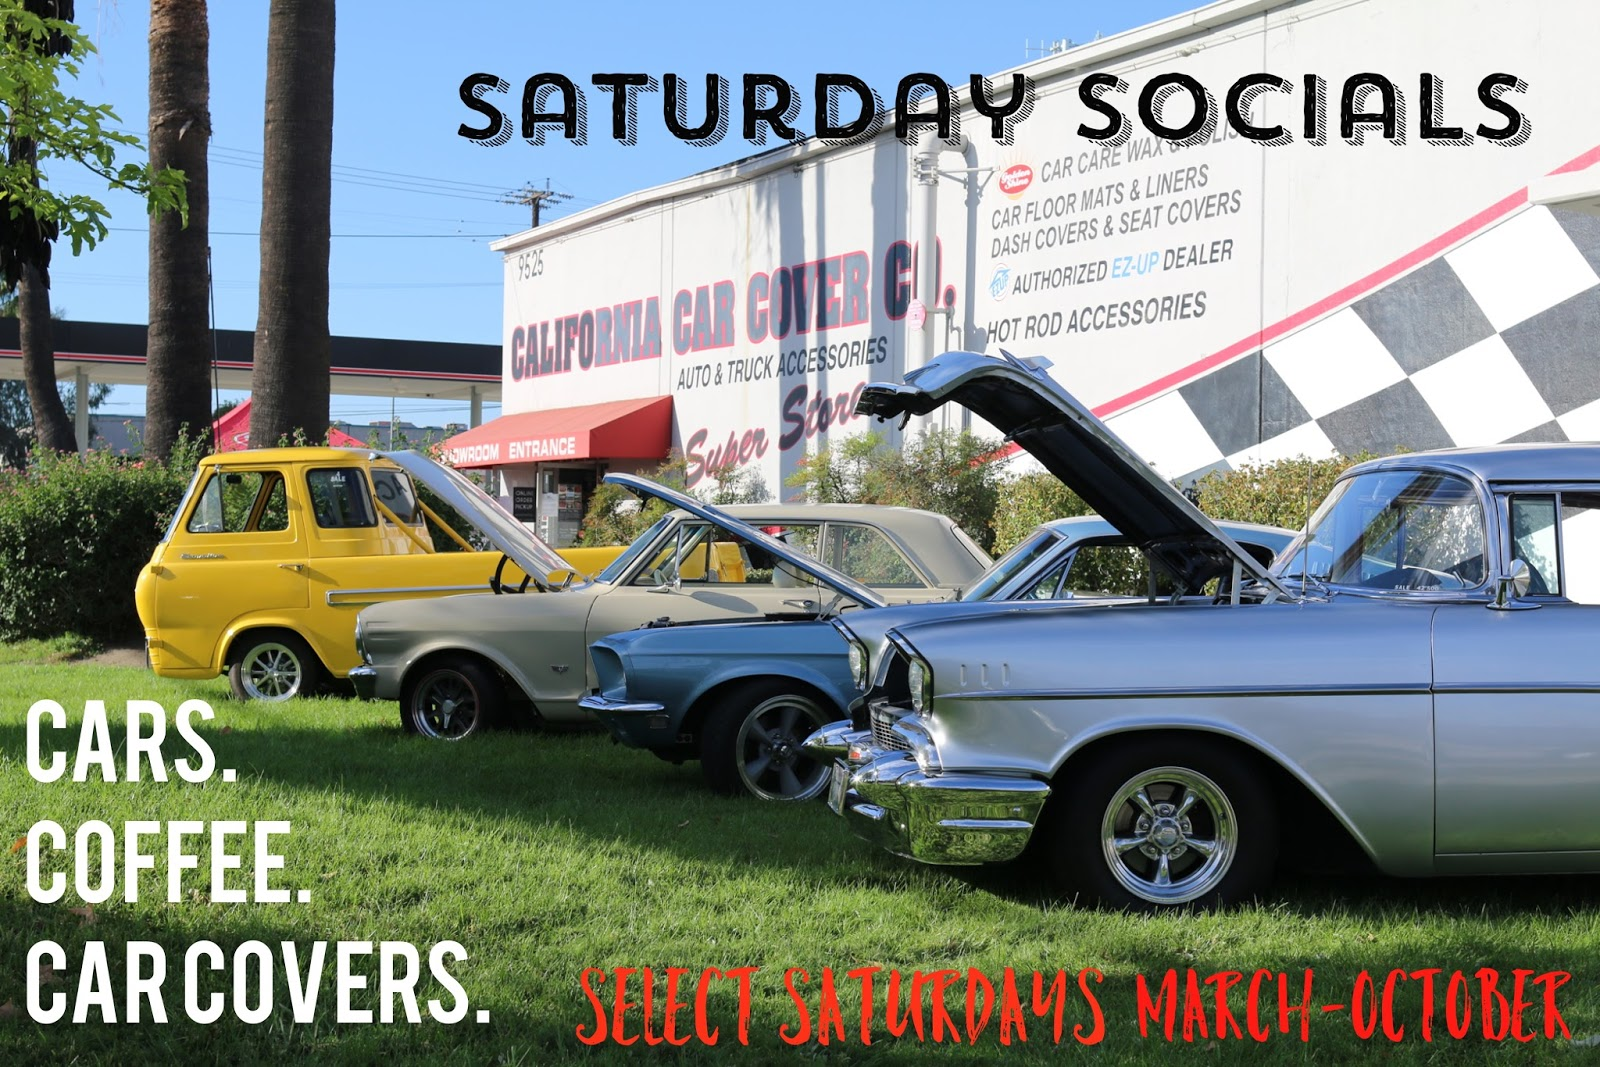 Covering Classic Cars Car Show Calendar At California Car Cover - Car show schedule